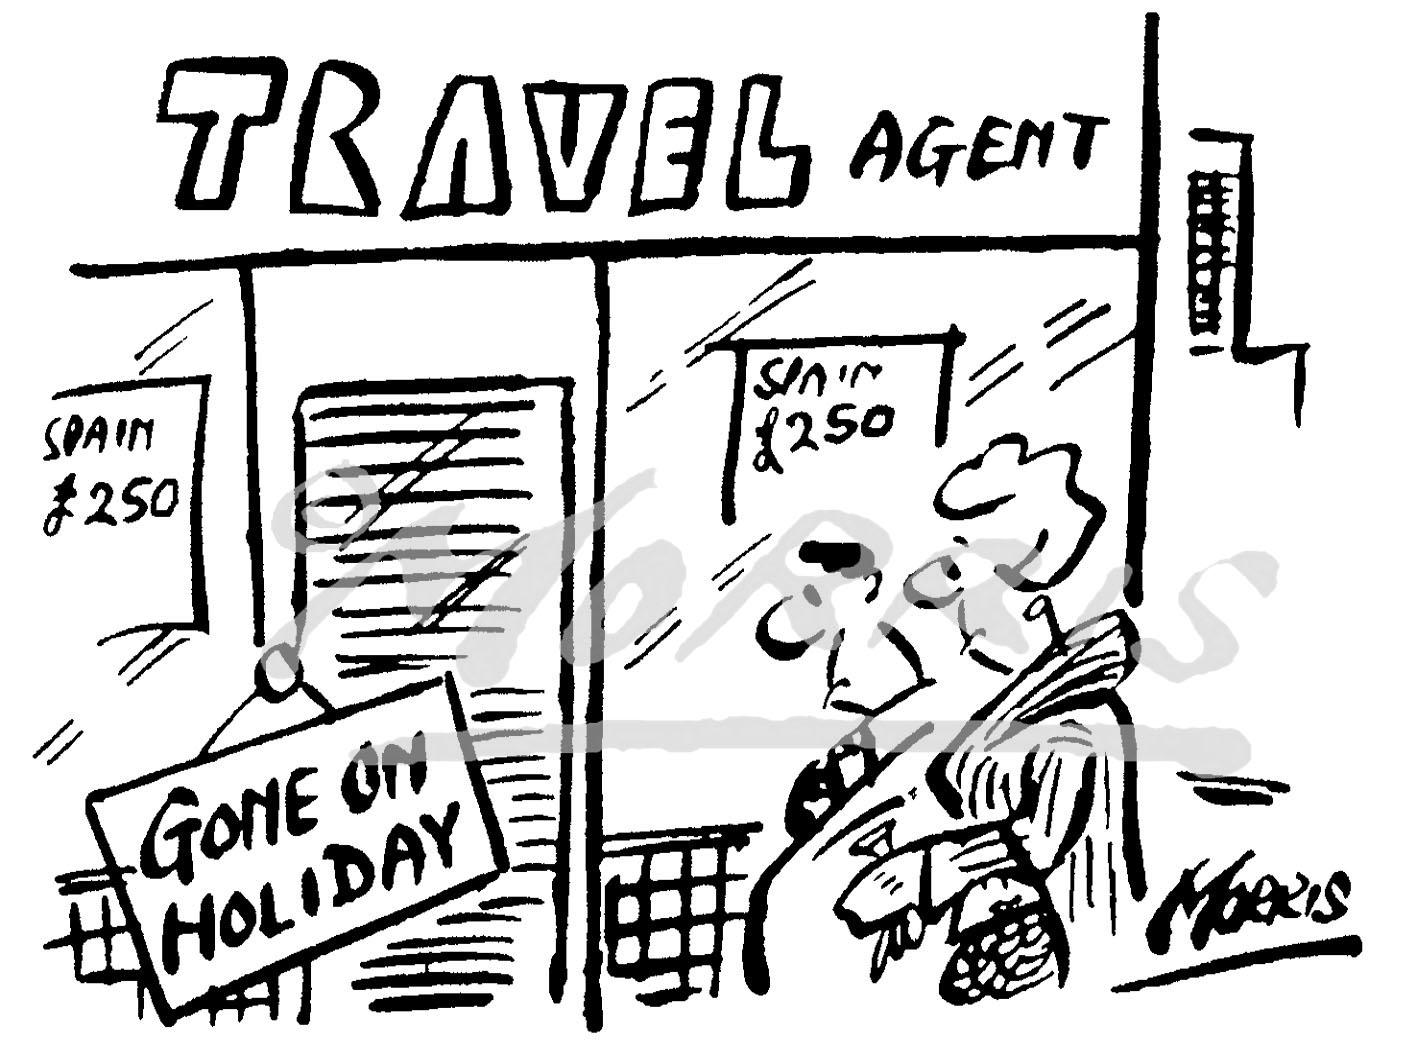 Travel Agent cartoon, Holiday cartoon, Vacation comic – Ref: 4709bw